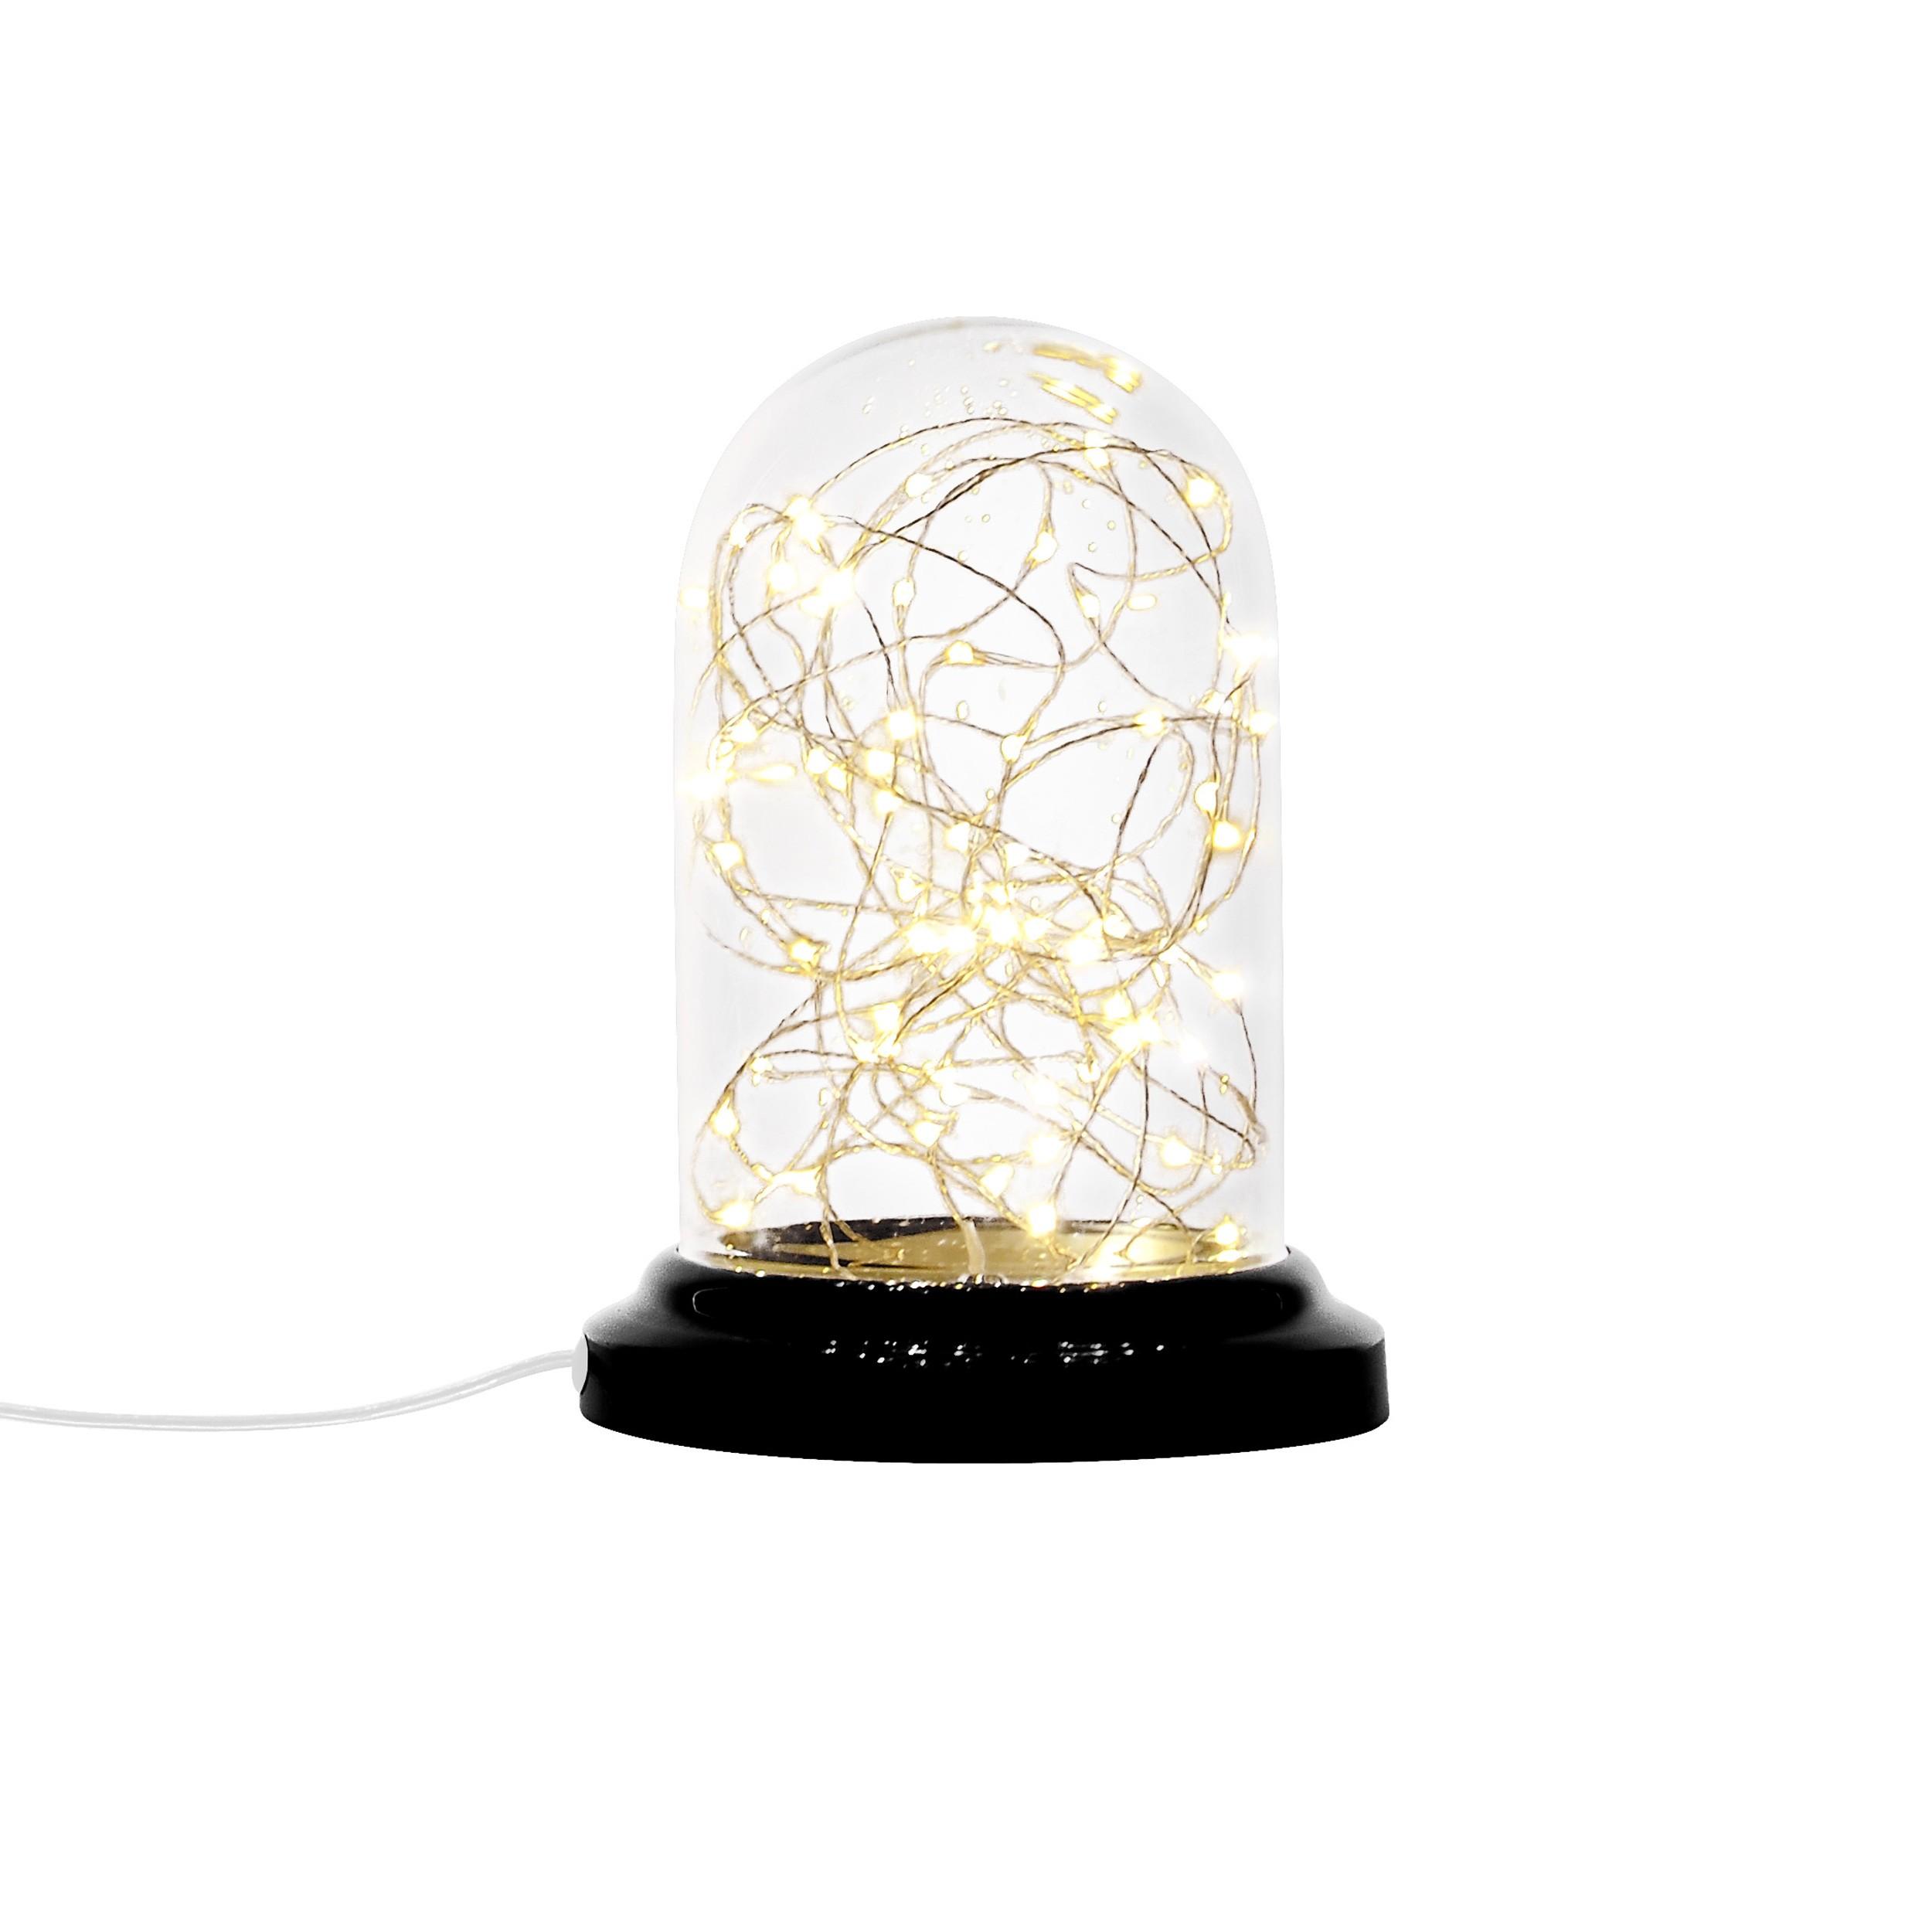 acheter lampe cloche guirlande noire